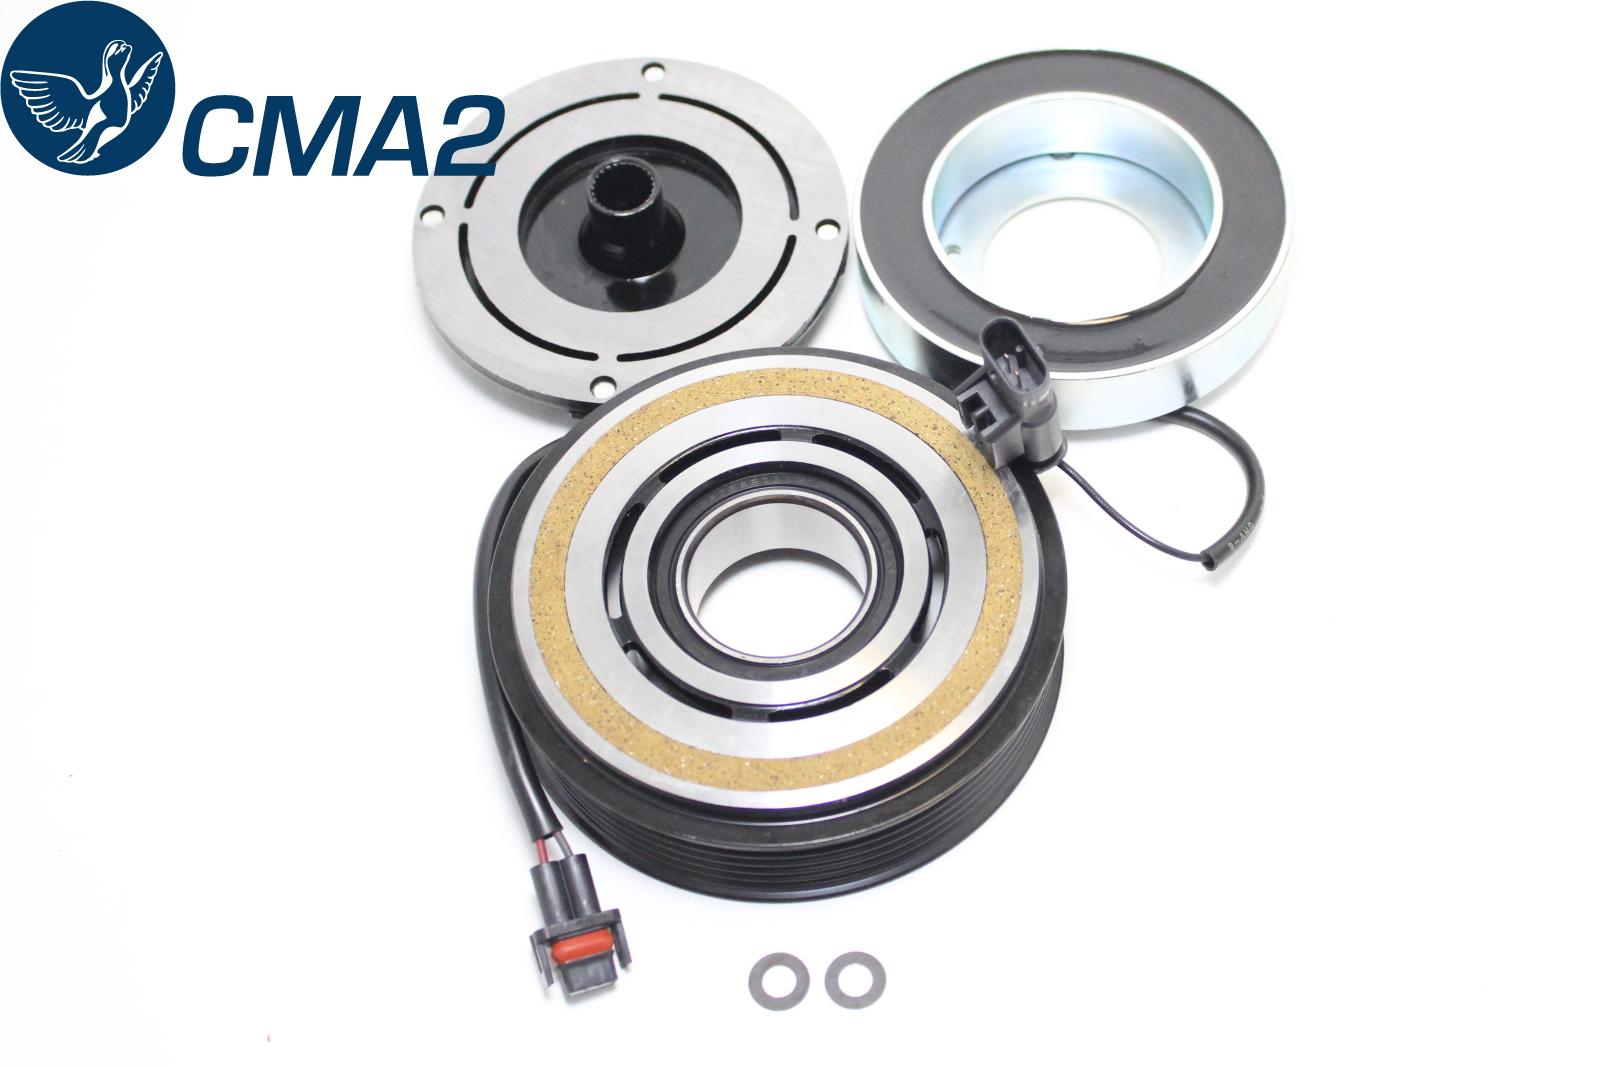 Шкив компрессора кондиционера Мерседес Бенц A0008303002 A0008306700 A0008303002 A0008306700